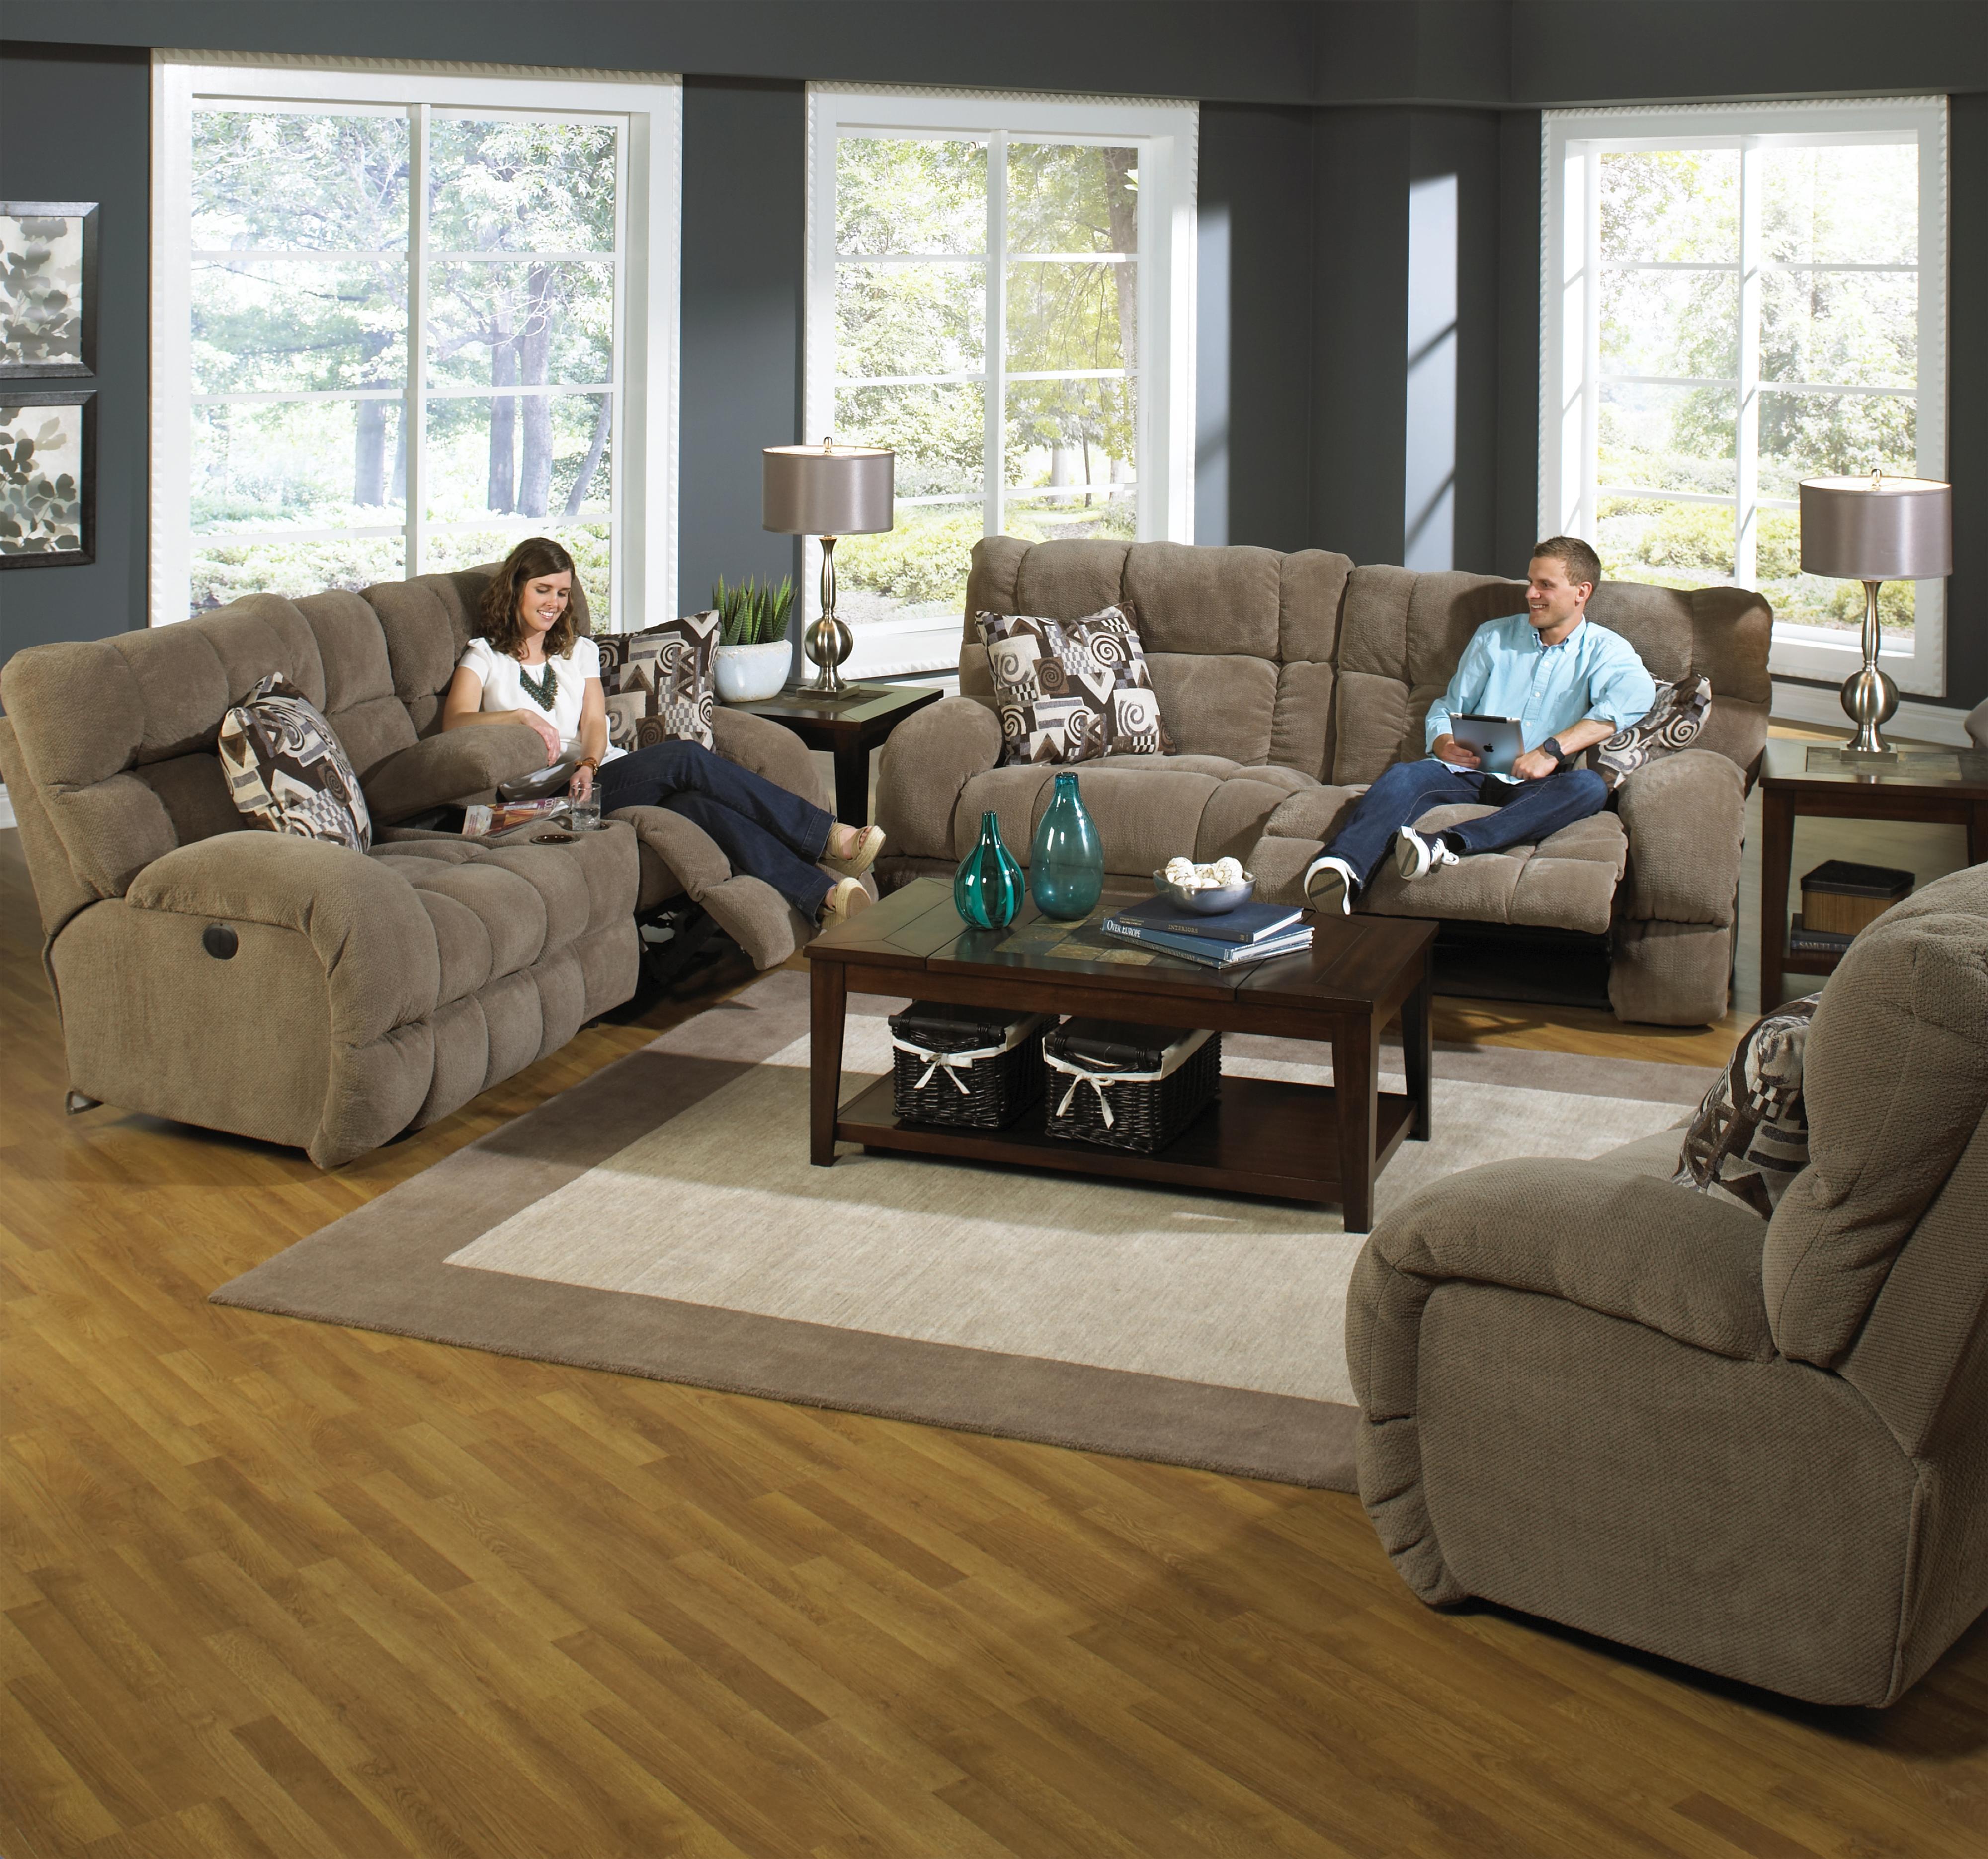 Genial Power Lay Flat Reclining Sofa